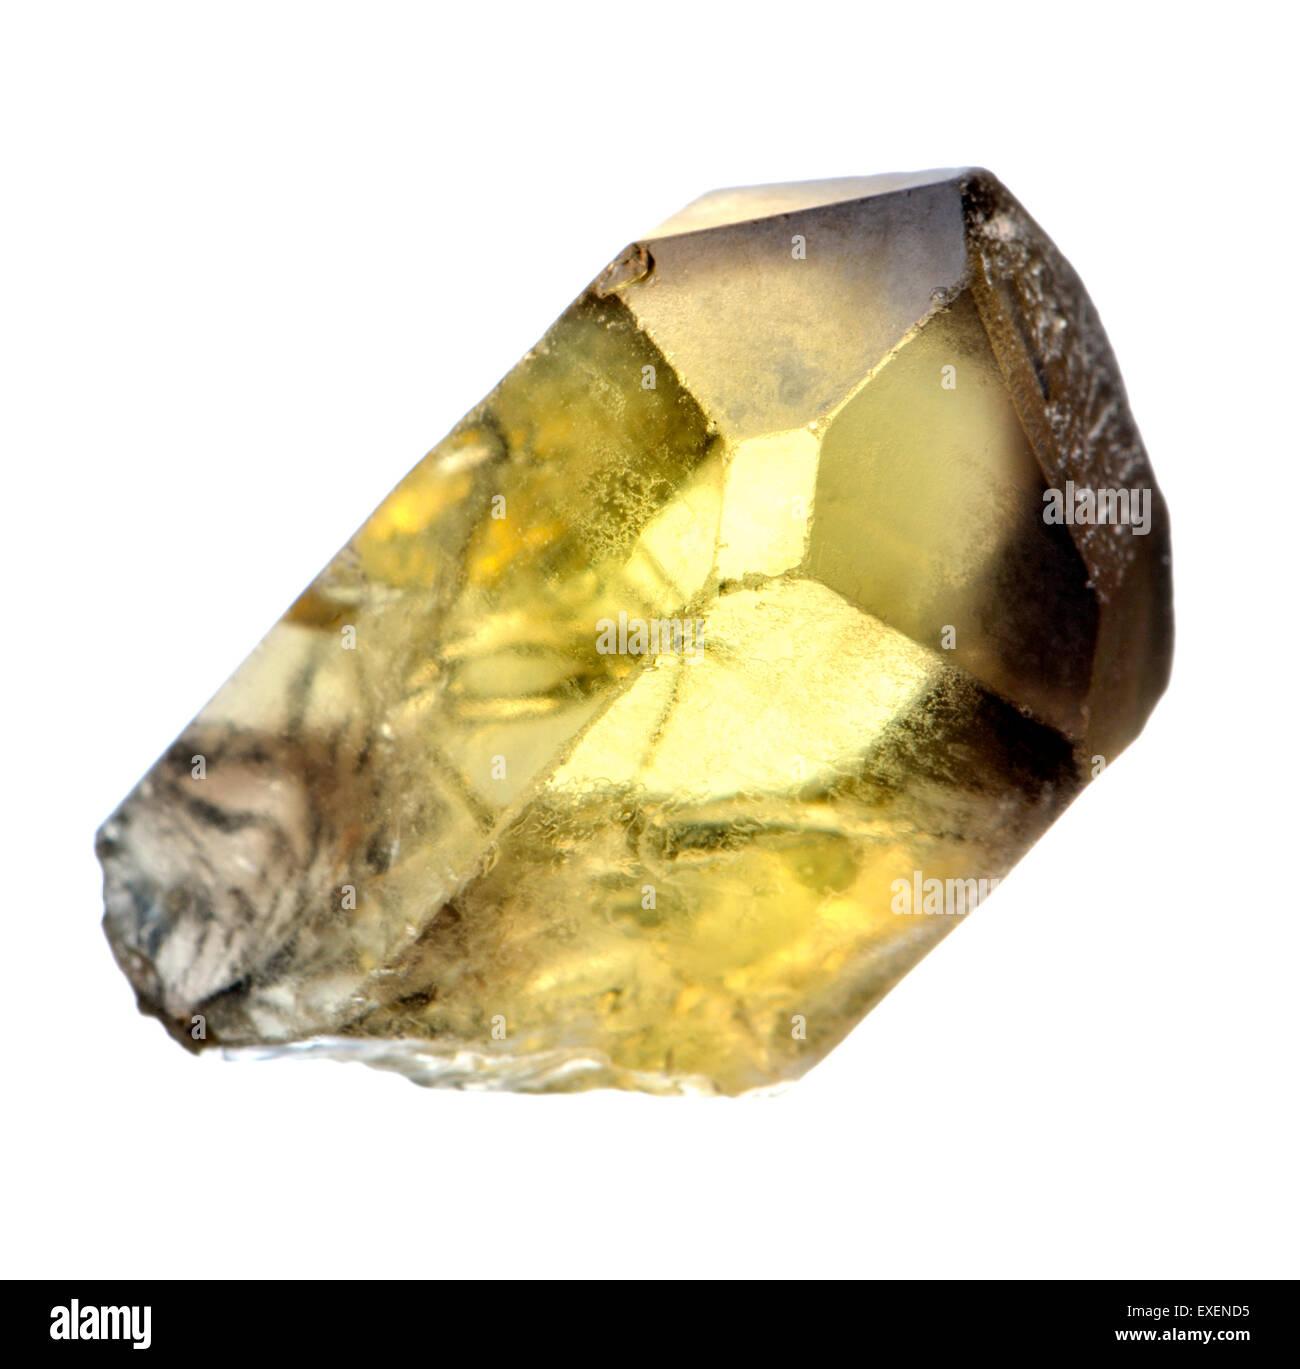 Citrine Point (hexagonal crystal of yellow quartz) - Stock Image